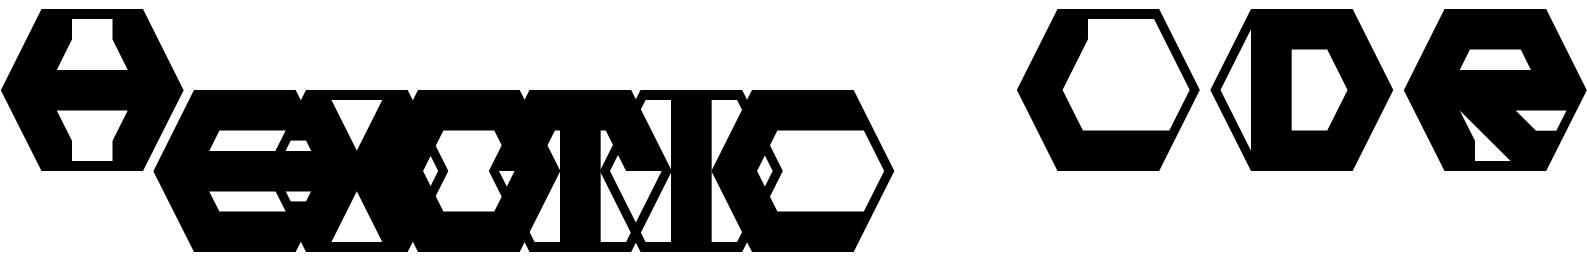 Hexotic LDR